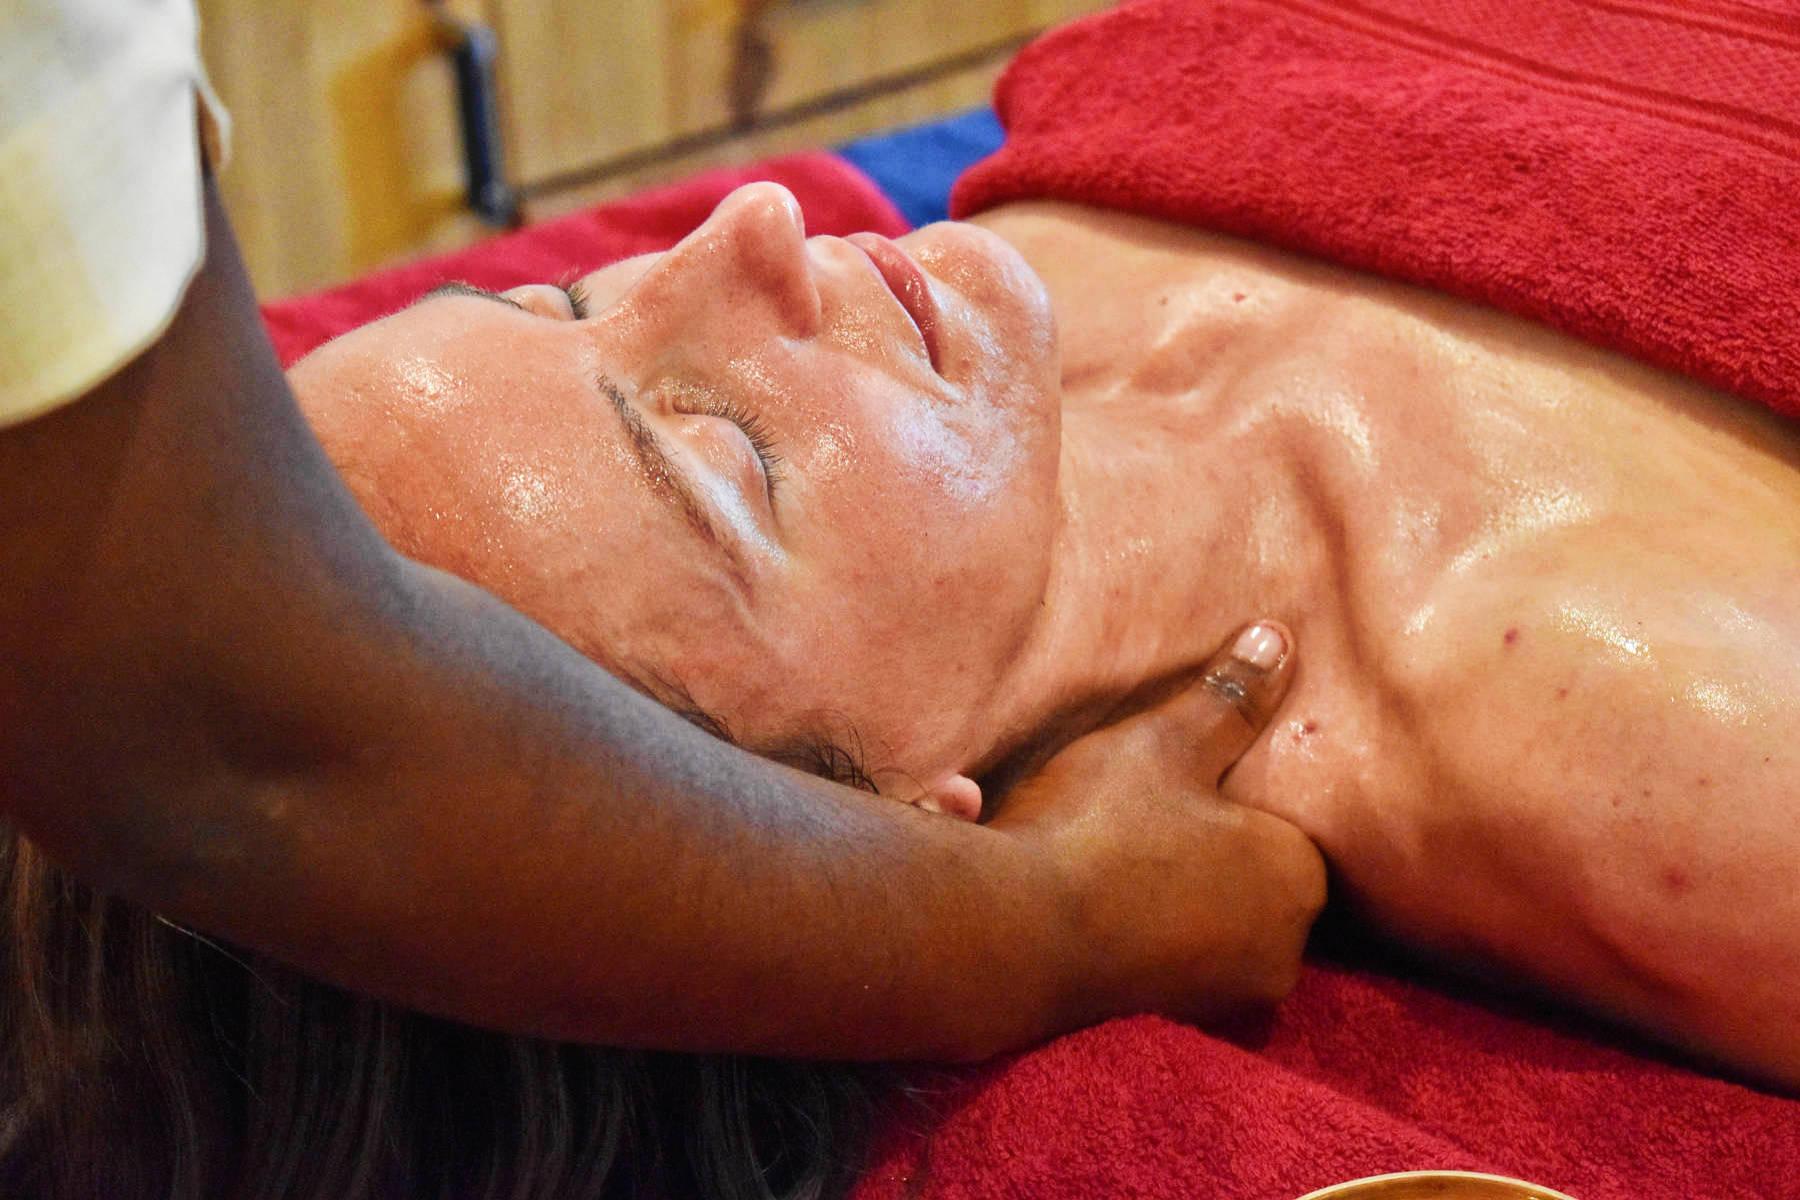 Veda5 Luxury Ayurveda Panchakarma Treatment Package - Wellness Retreat for Healing and Cure in Himalayas - Rishikesh India International